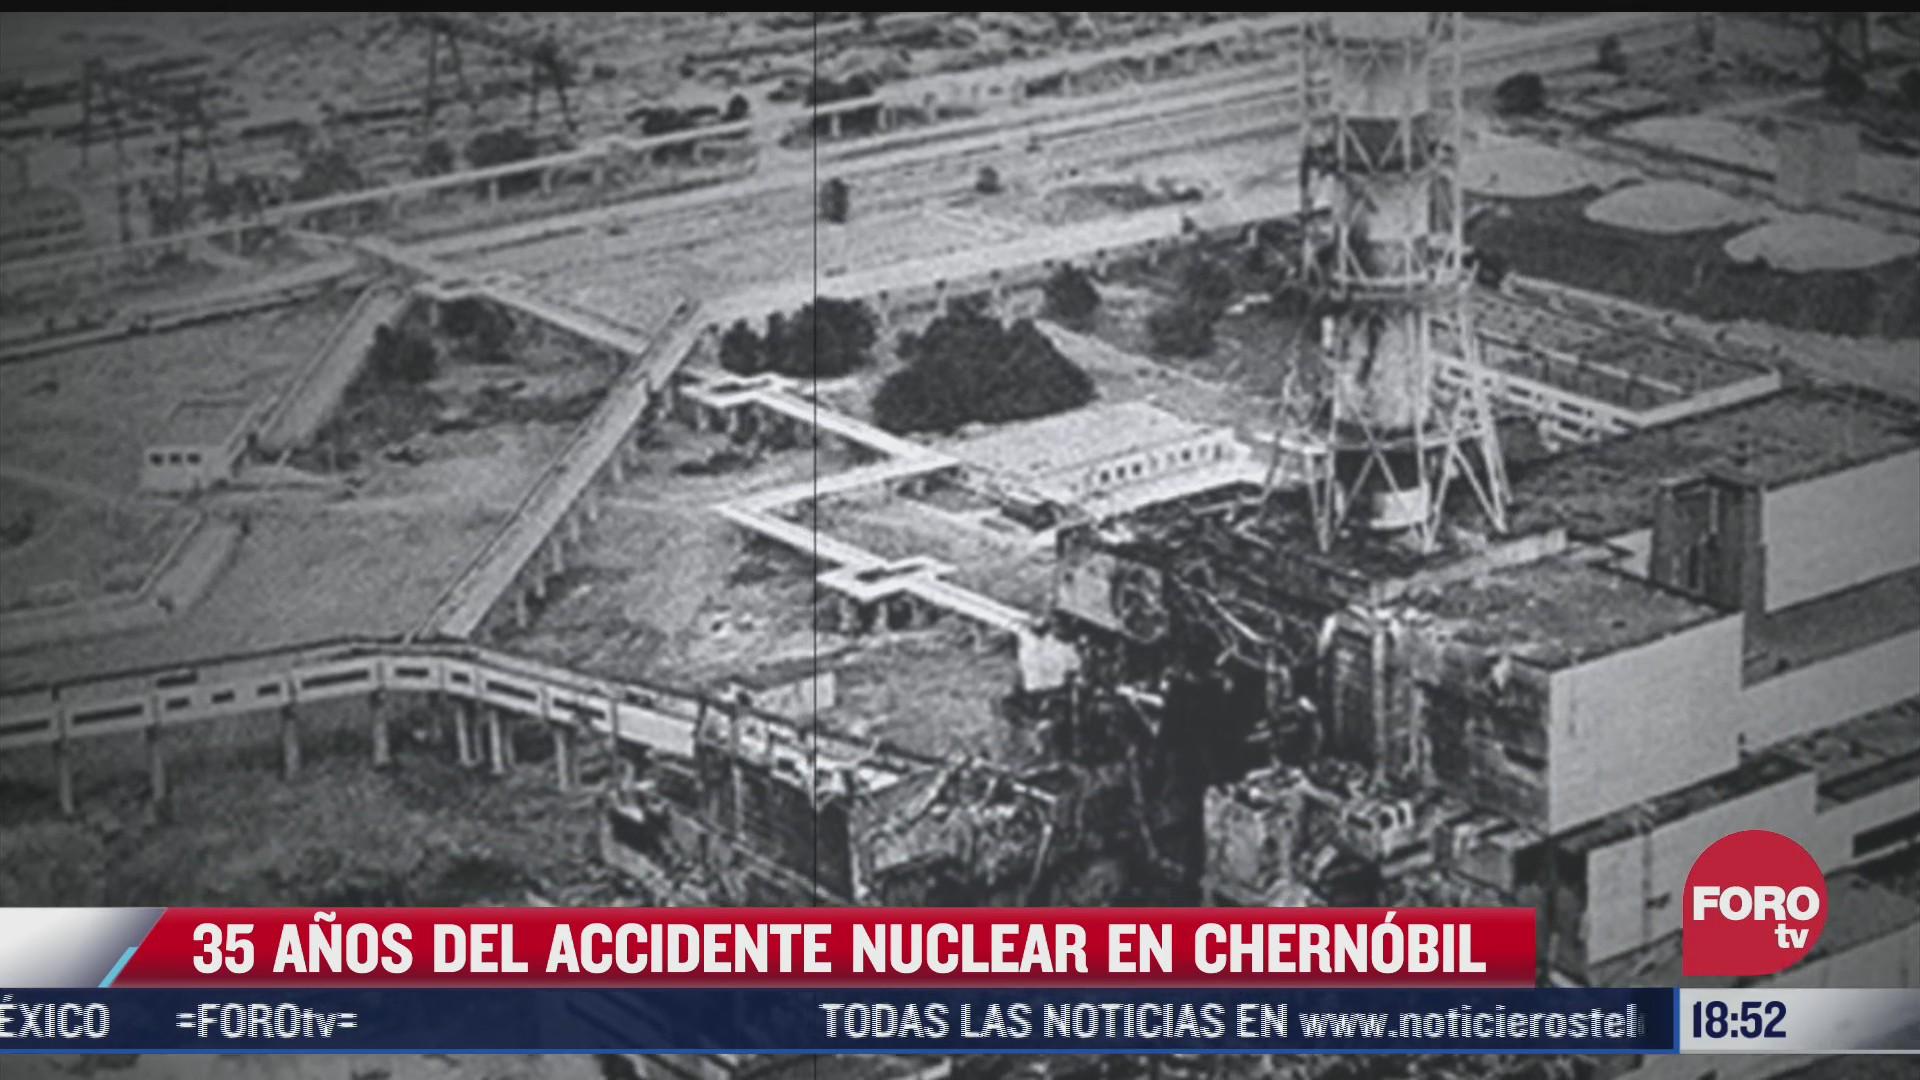 accidente nuclear de chernobil cumple 35 anos